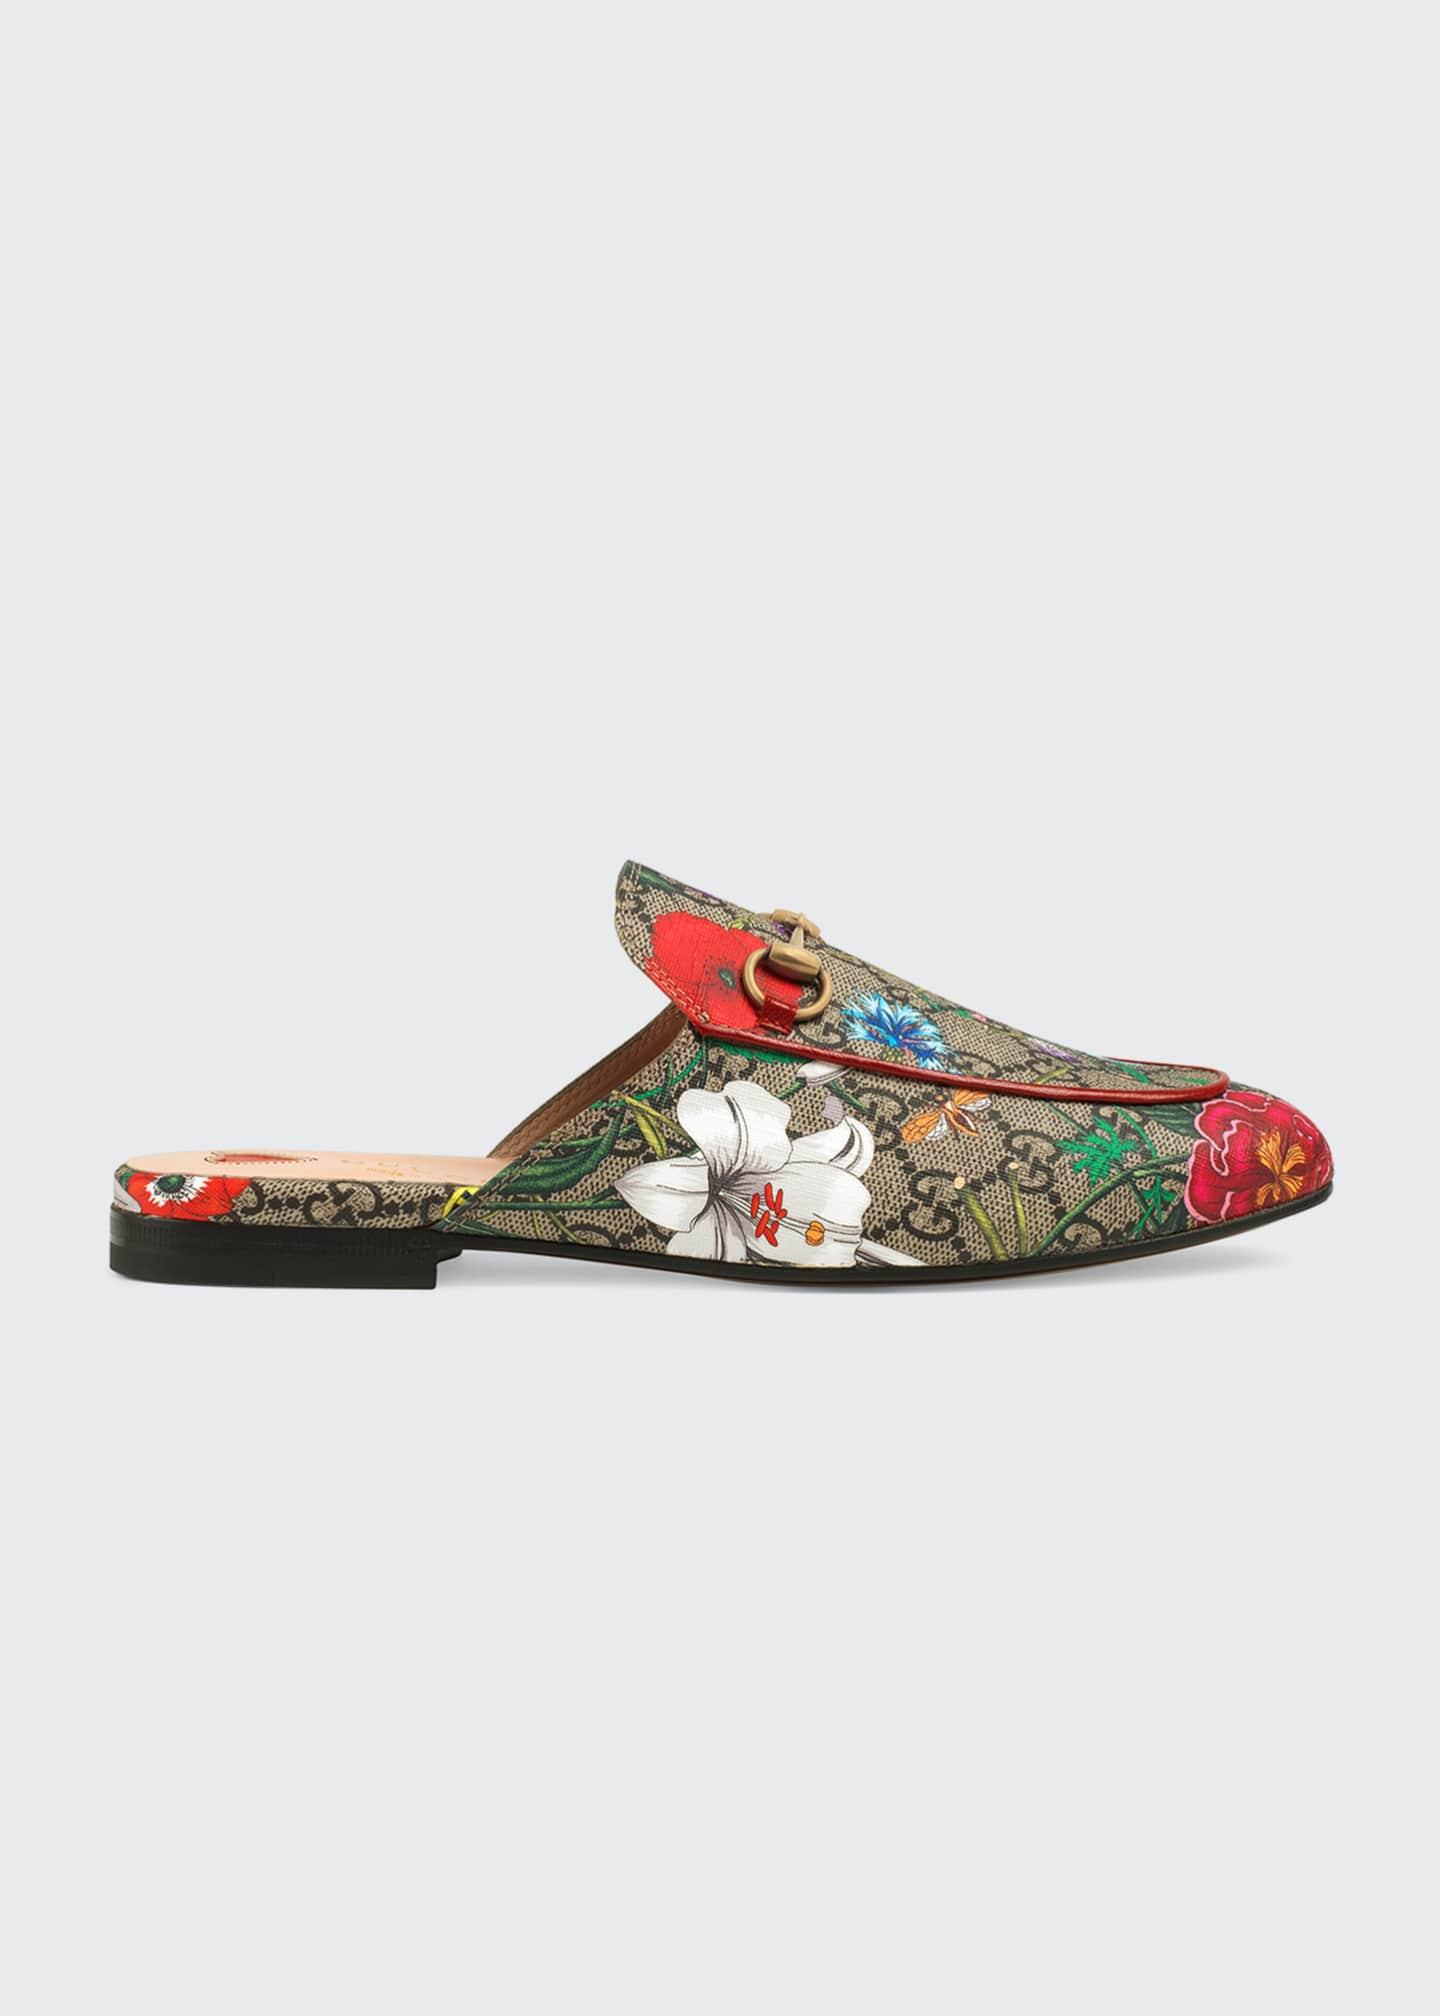 Gucci Princetown GG Supreme Flora Horsebit Mules